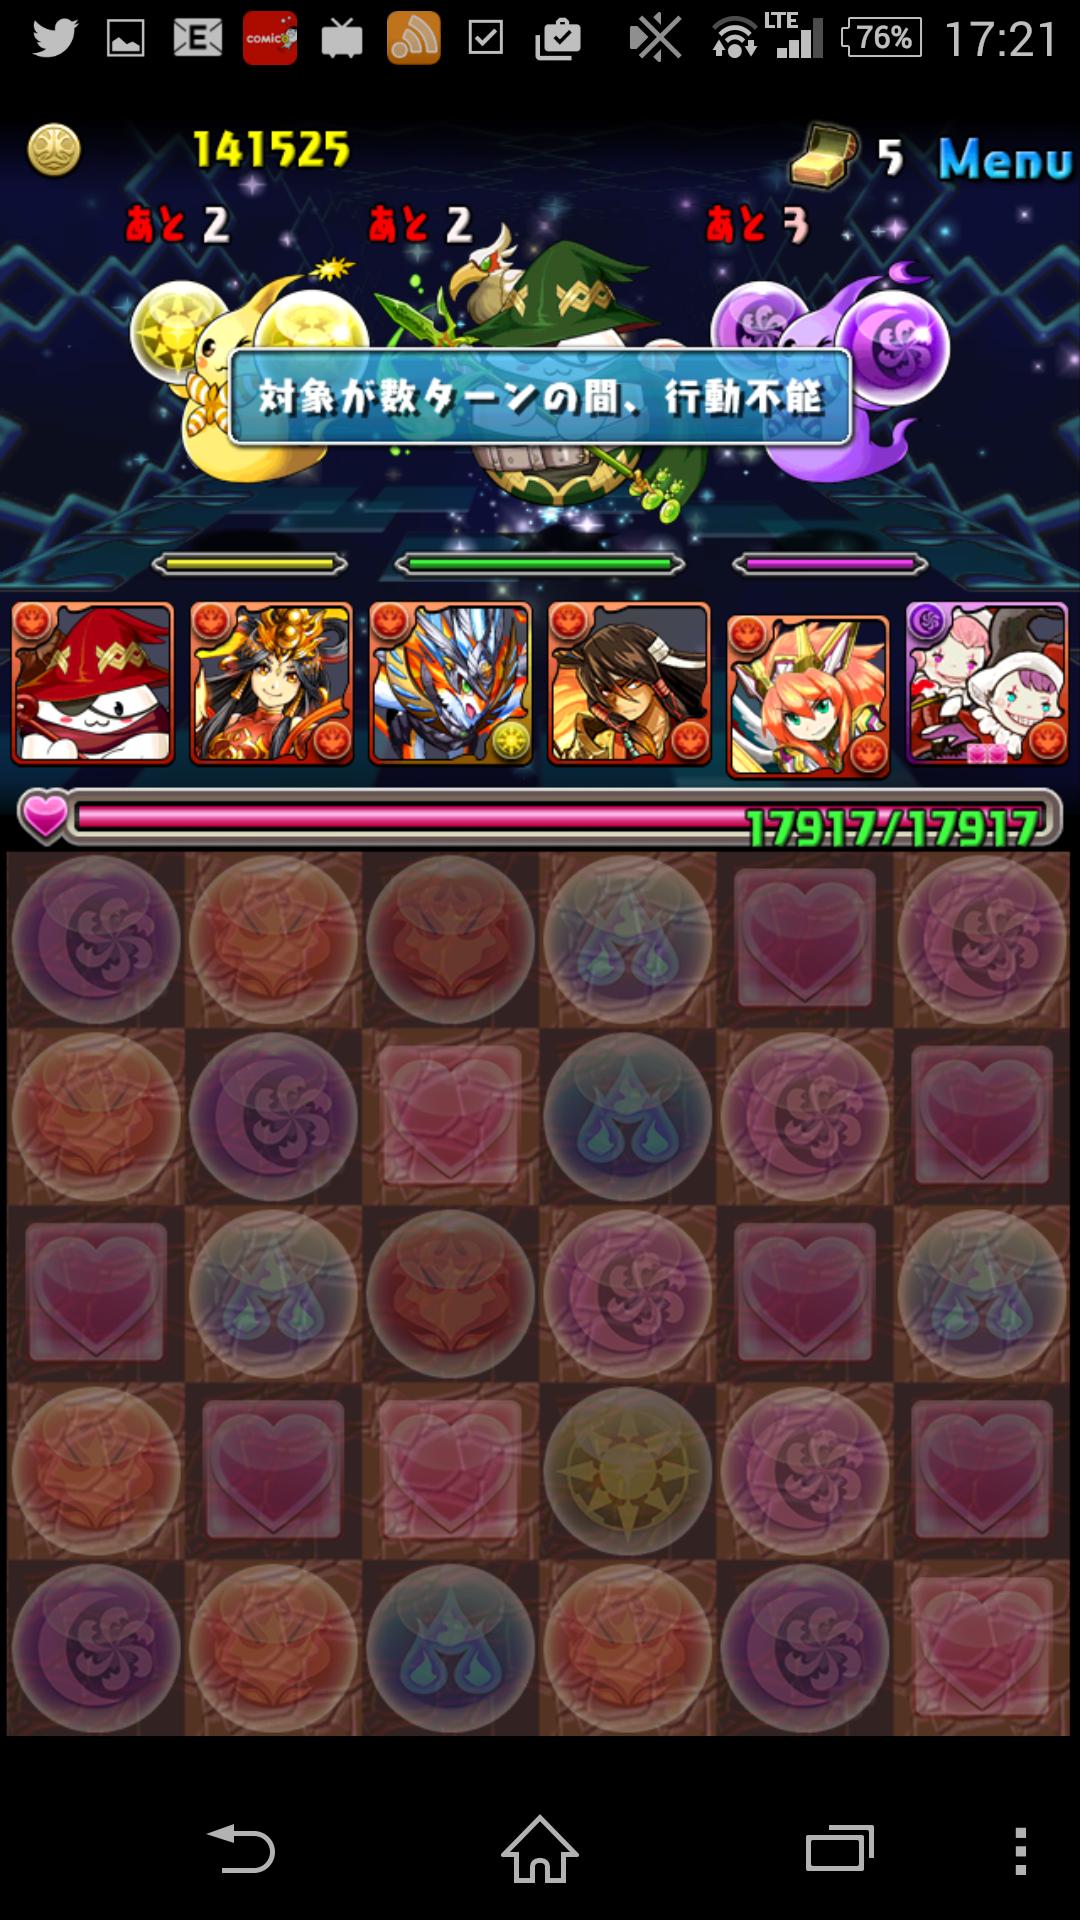 Screenshot_2015-03-21-17-21-29.png